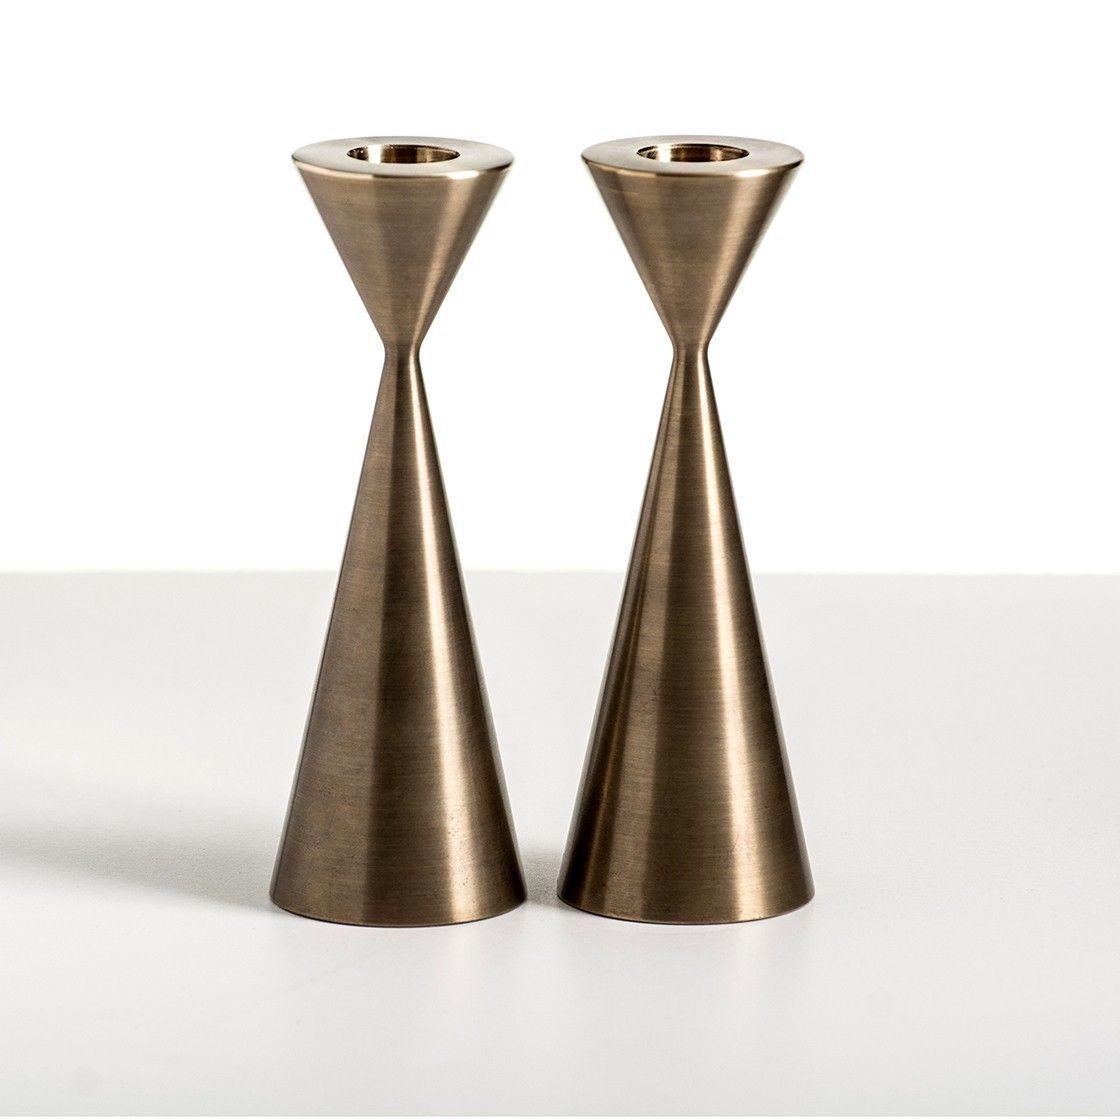 Taper Candlesticks - Brass | Fern & Roby